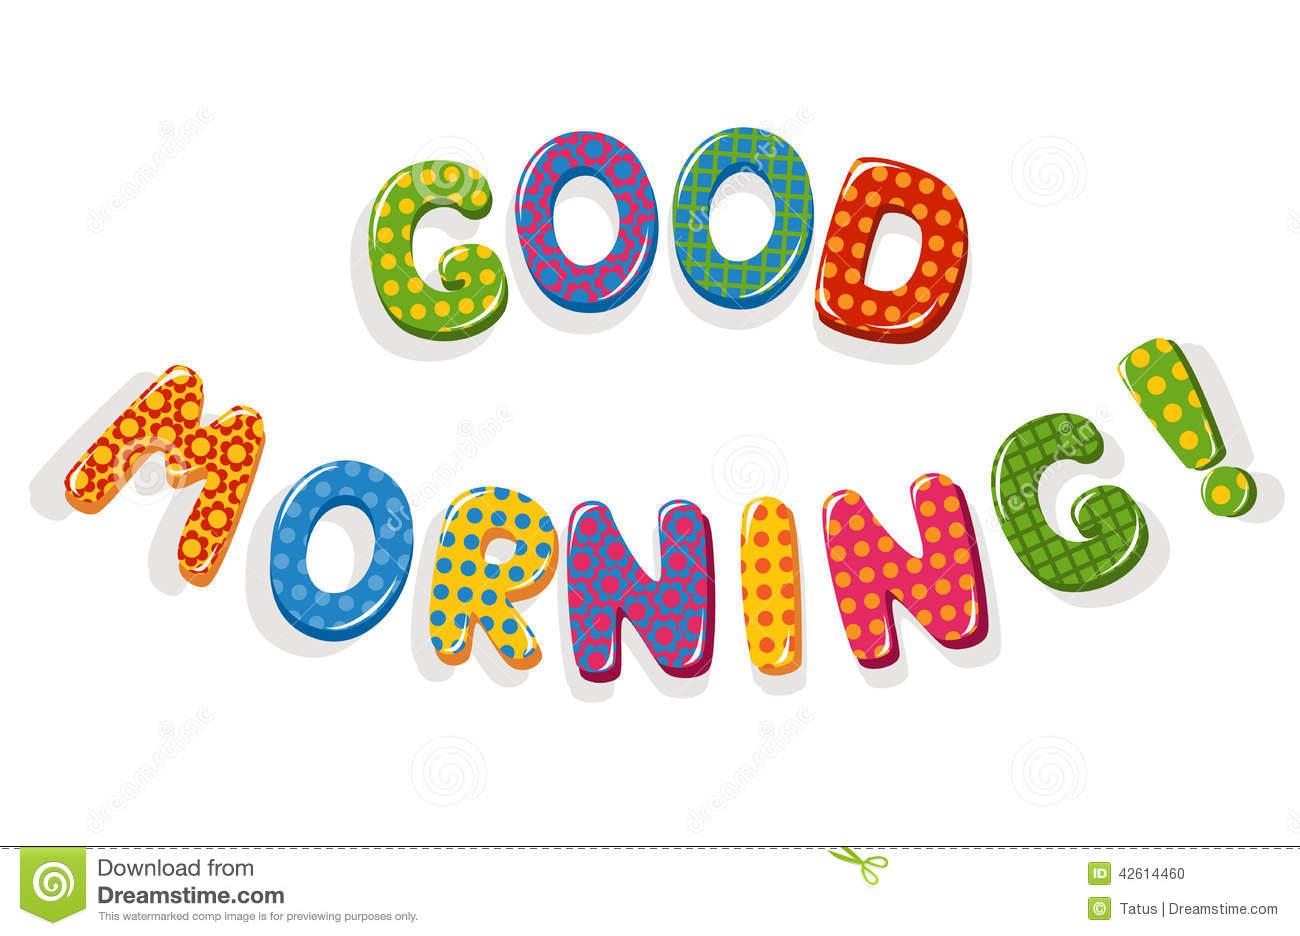 Good Morning Clipart .-Good Morning Clipart .-11